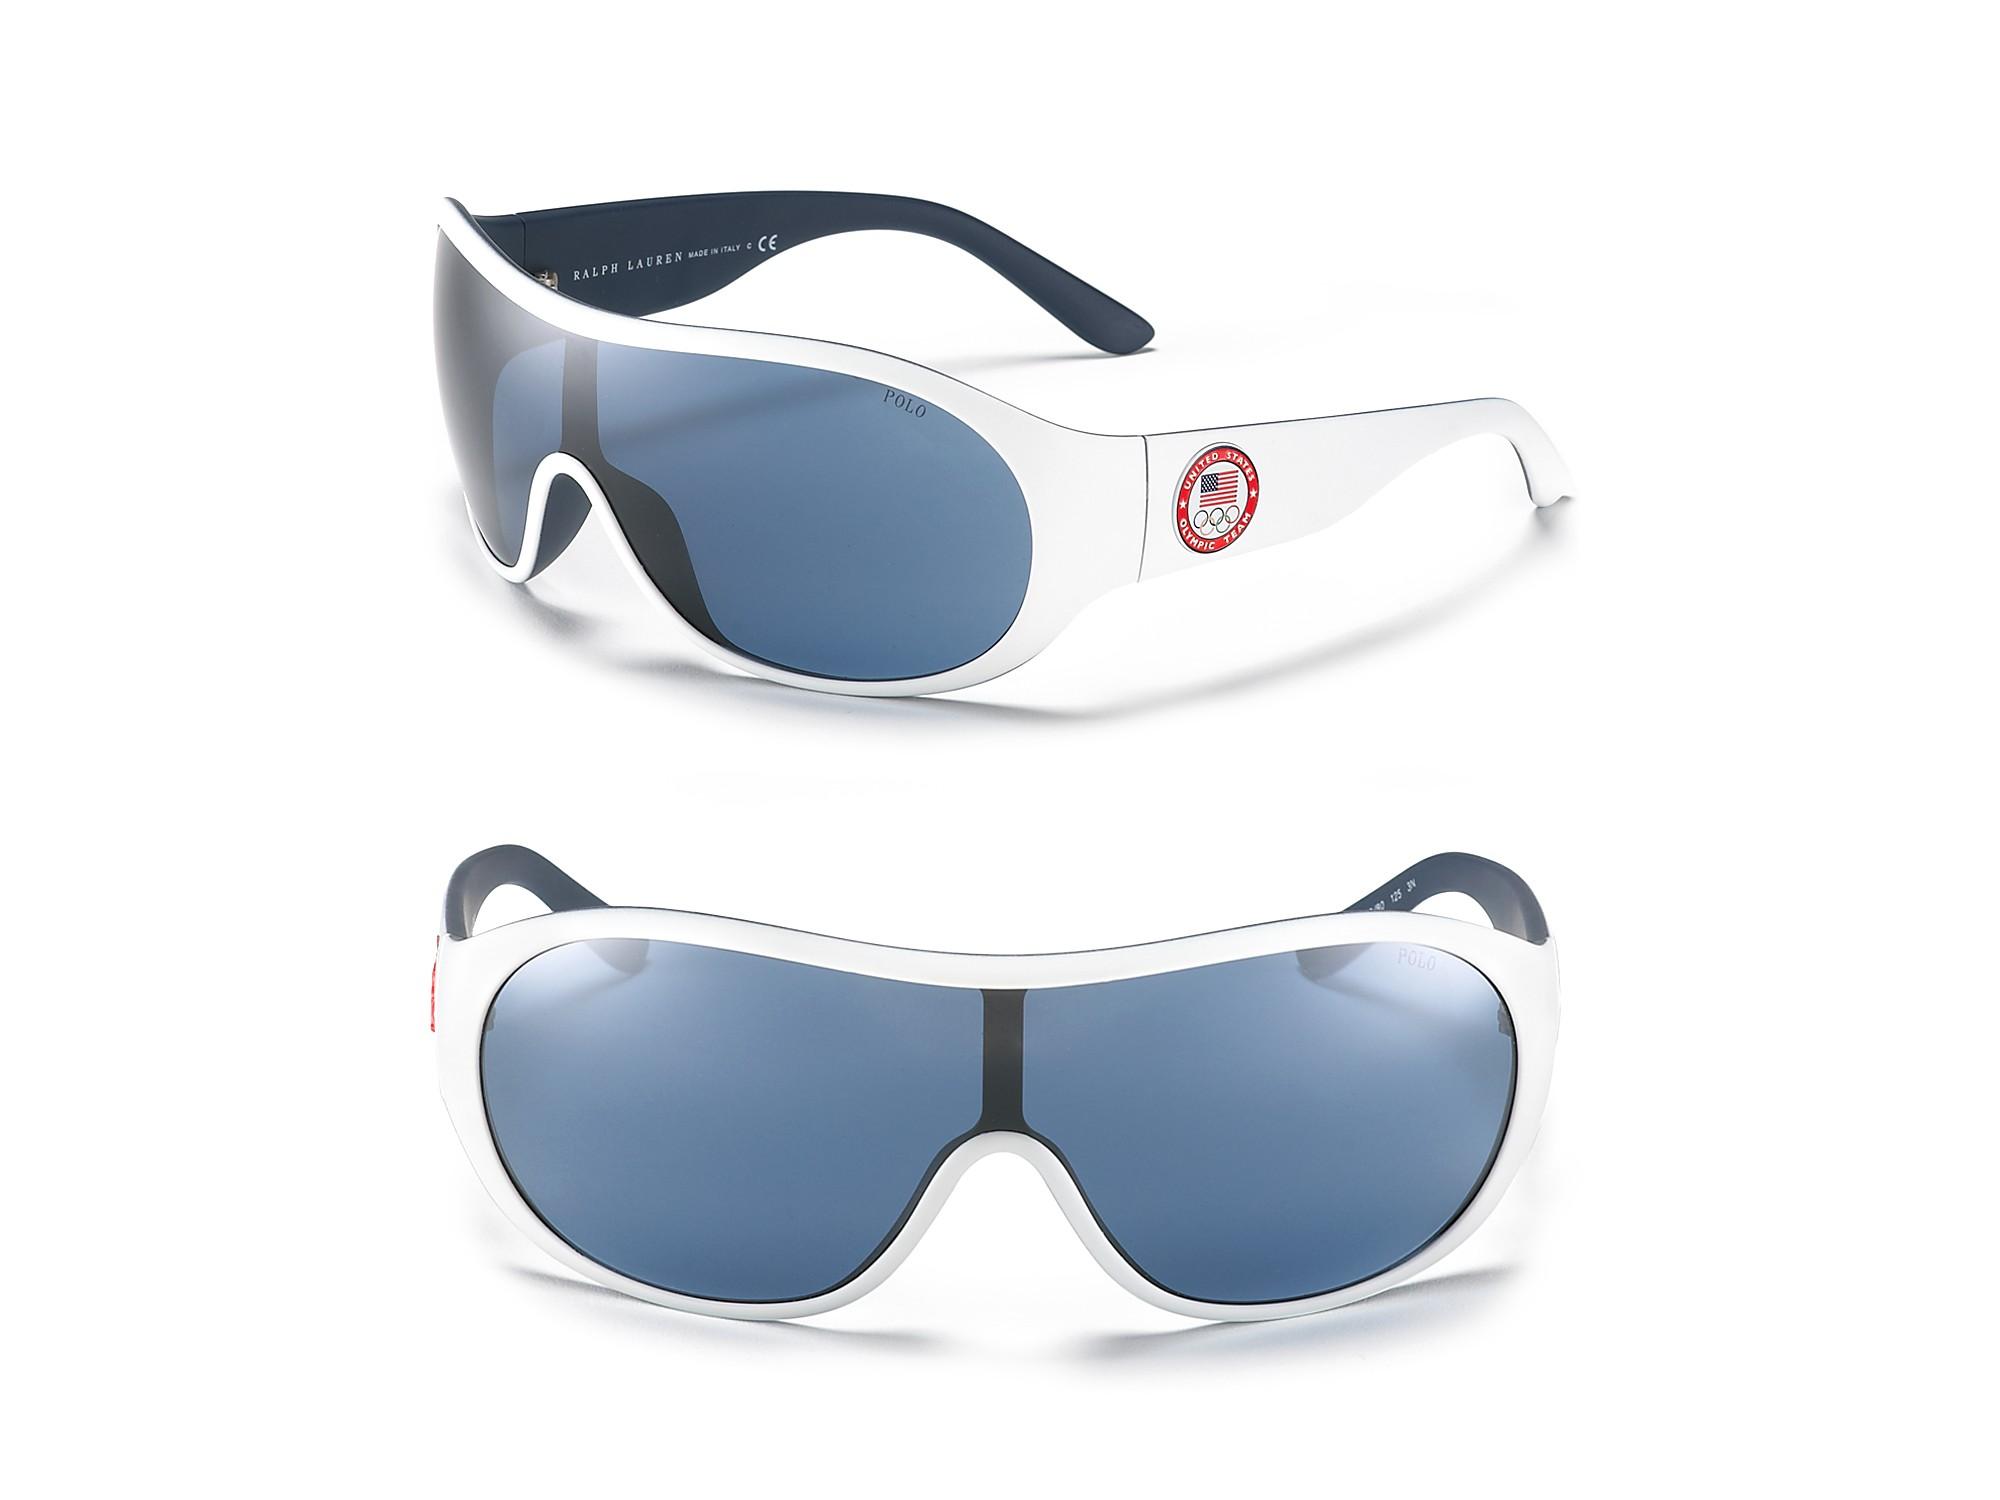 Ralph Lauren Sunglasses Blue  polo ralph lauren olympic shield sunglasses in blue for men lyst